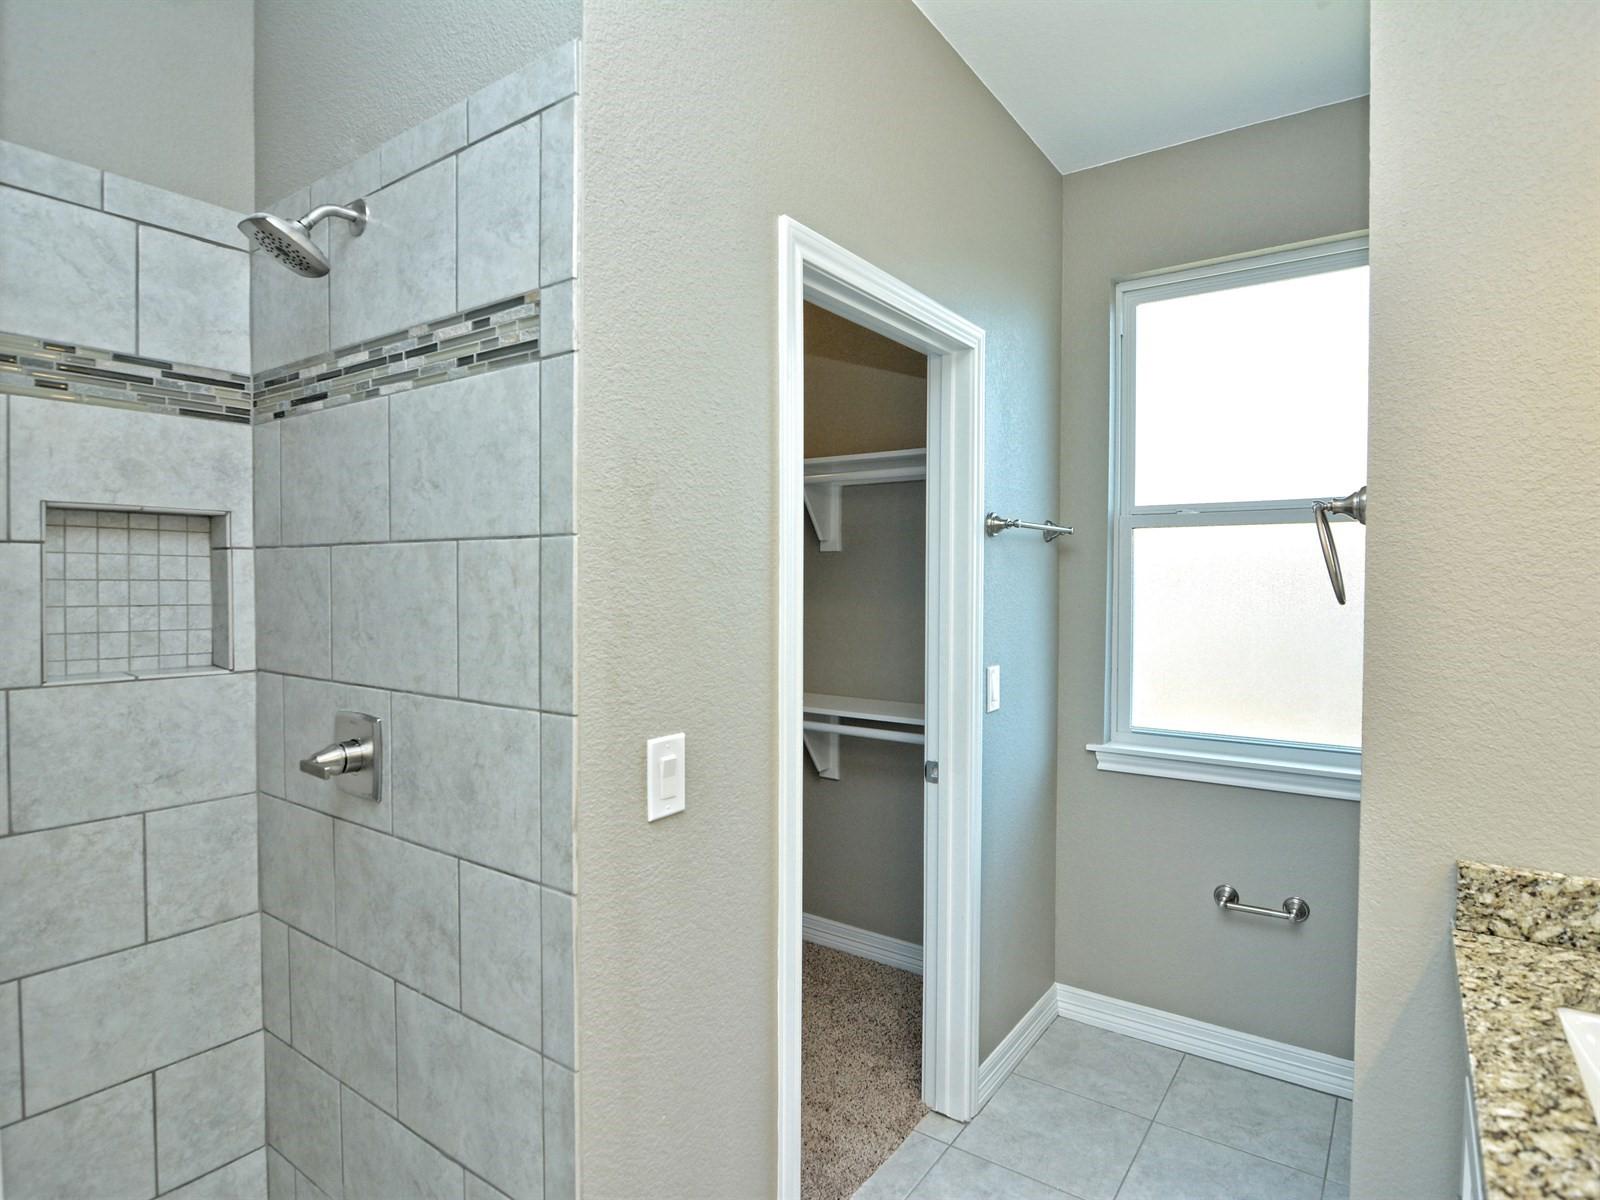 023_Master Bathroom 2.jpg